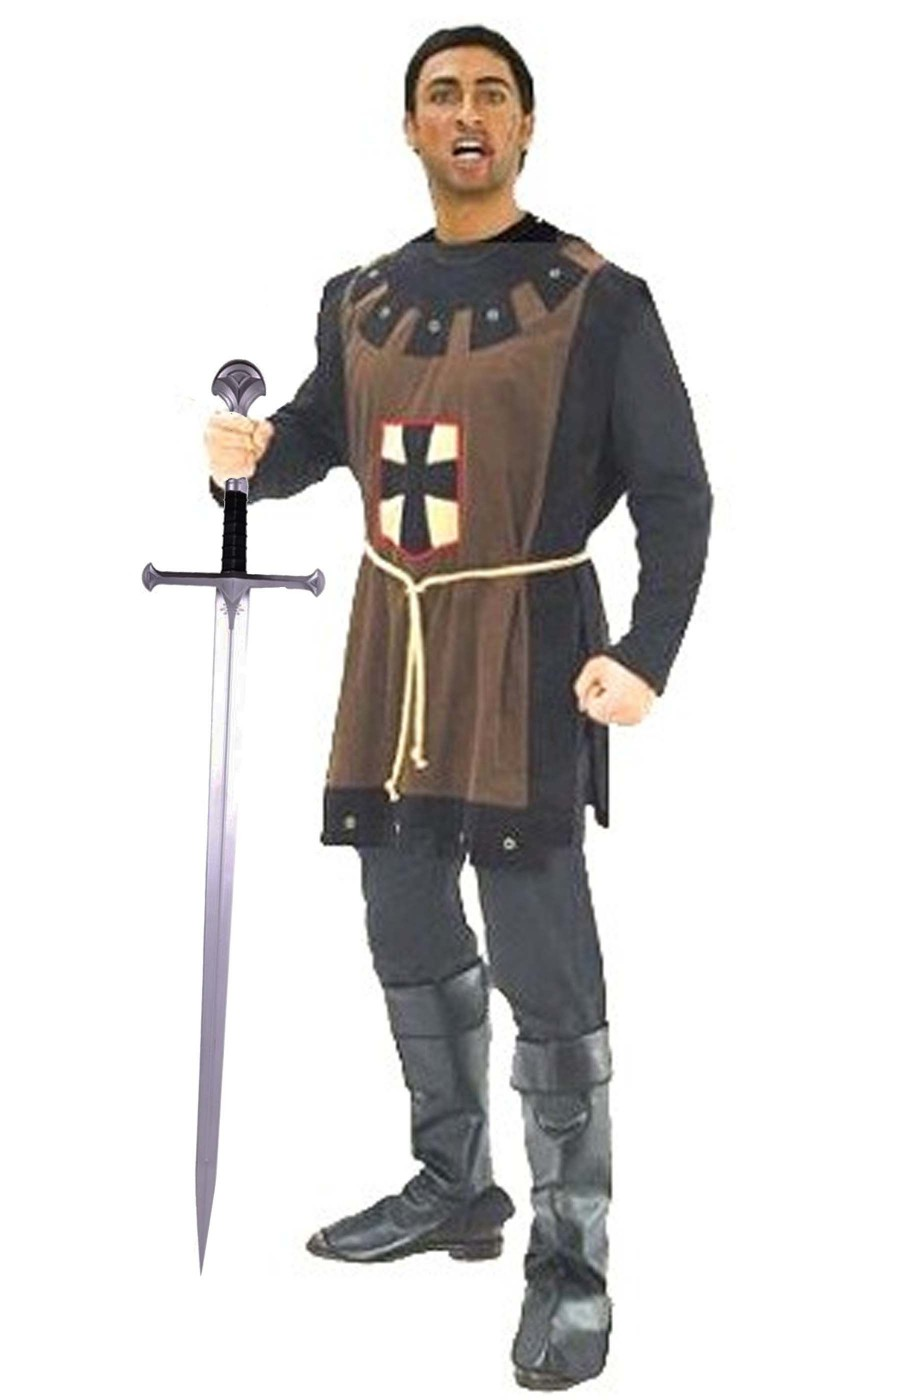 Costume uomo medievale con tunica a tabarda - CarnivalHalloween.com d764ba39812b